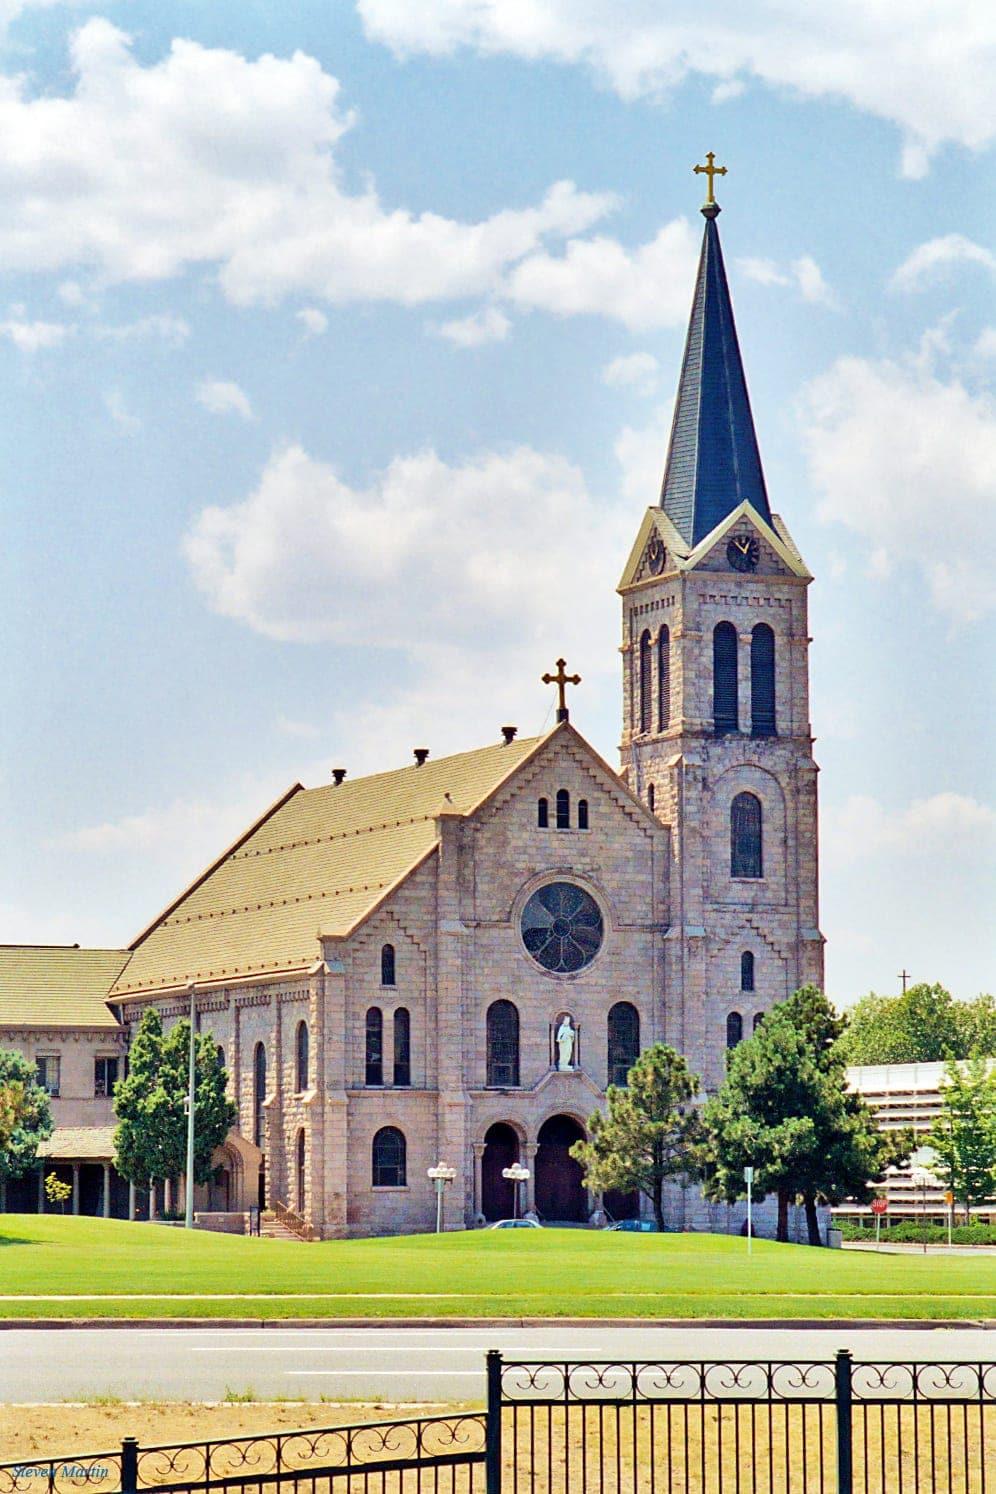 St. Elizabeth of Hungary Church